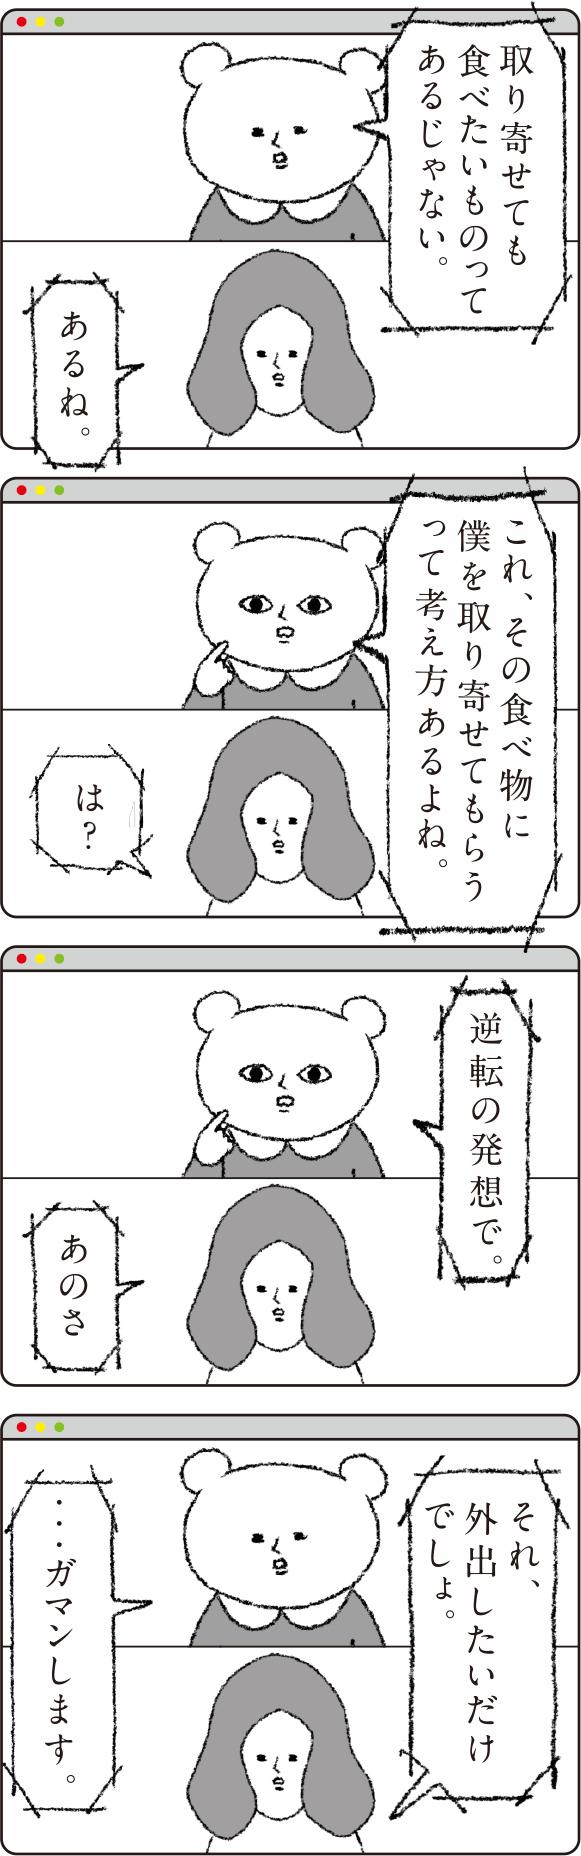 Hanako 1185号:おかわり自由